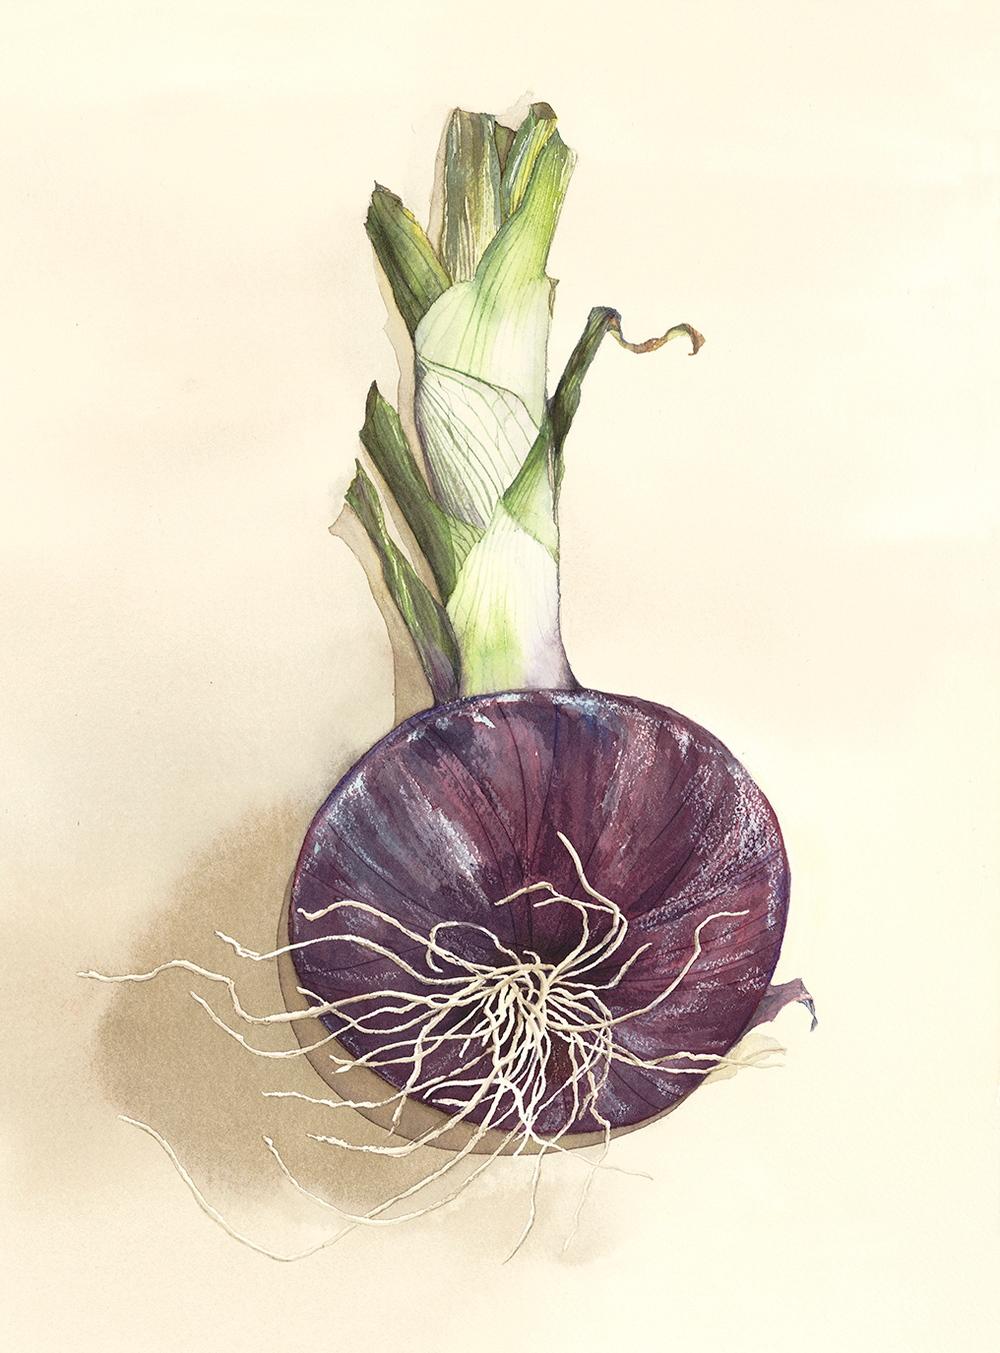 2393_Onion.jpg